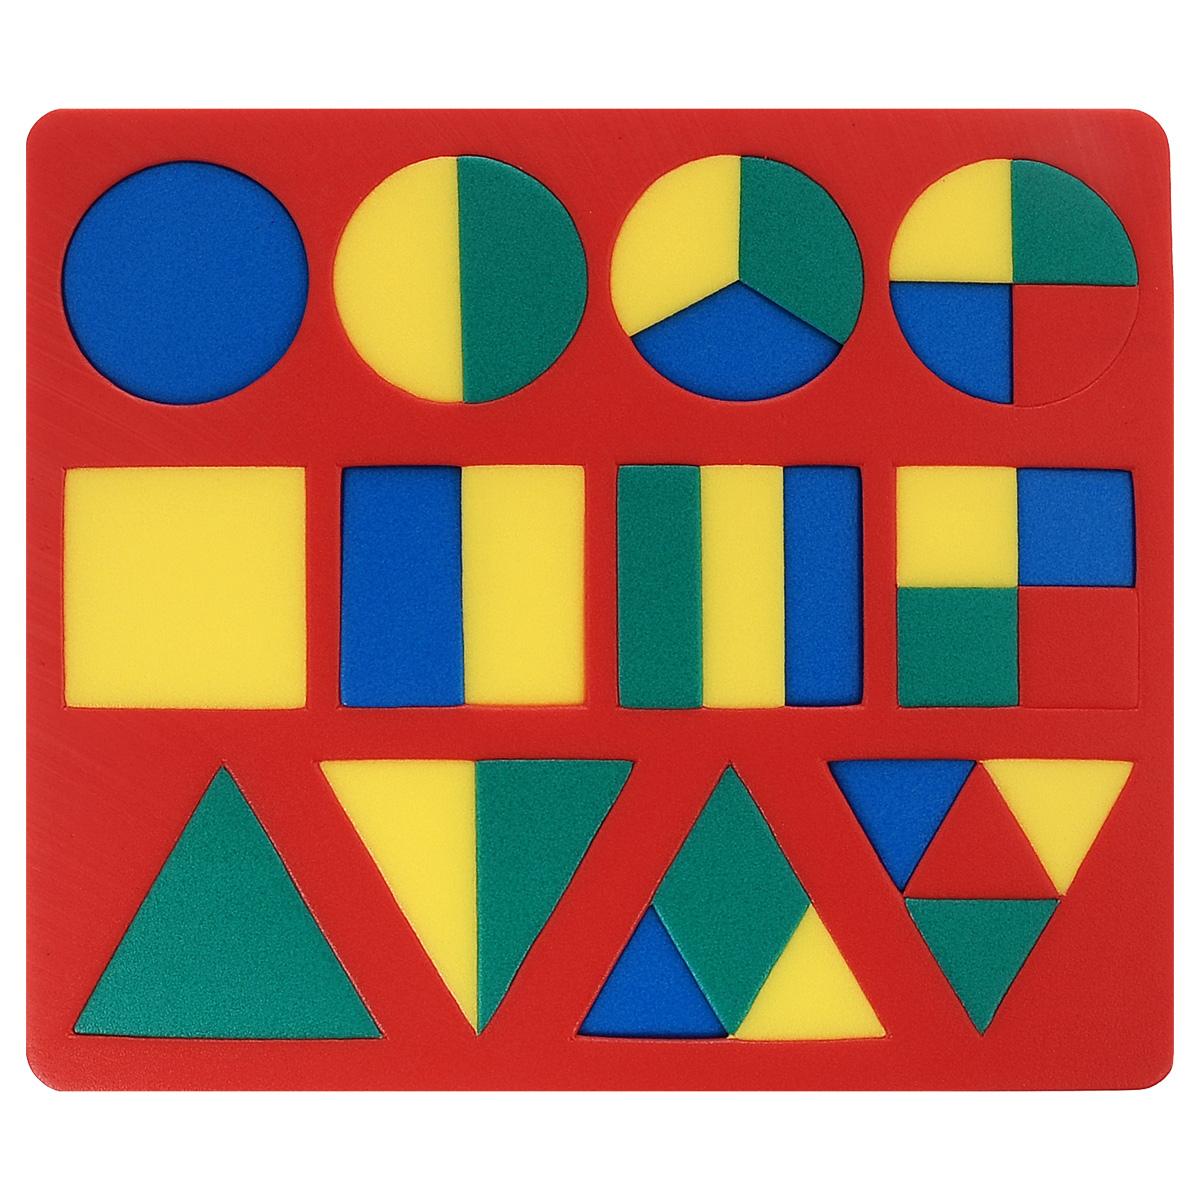 Флексика Пазл для малышей Геометрия цвет основы красный флексика пазл для малышей попугай цвет основы красный